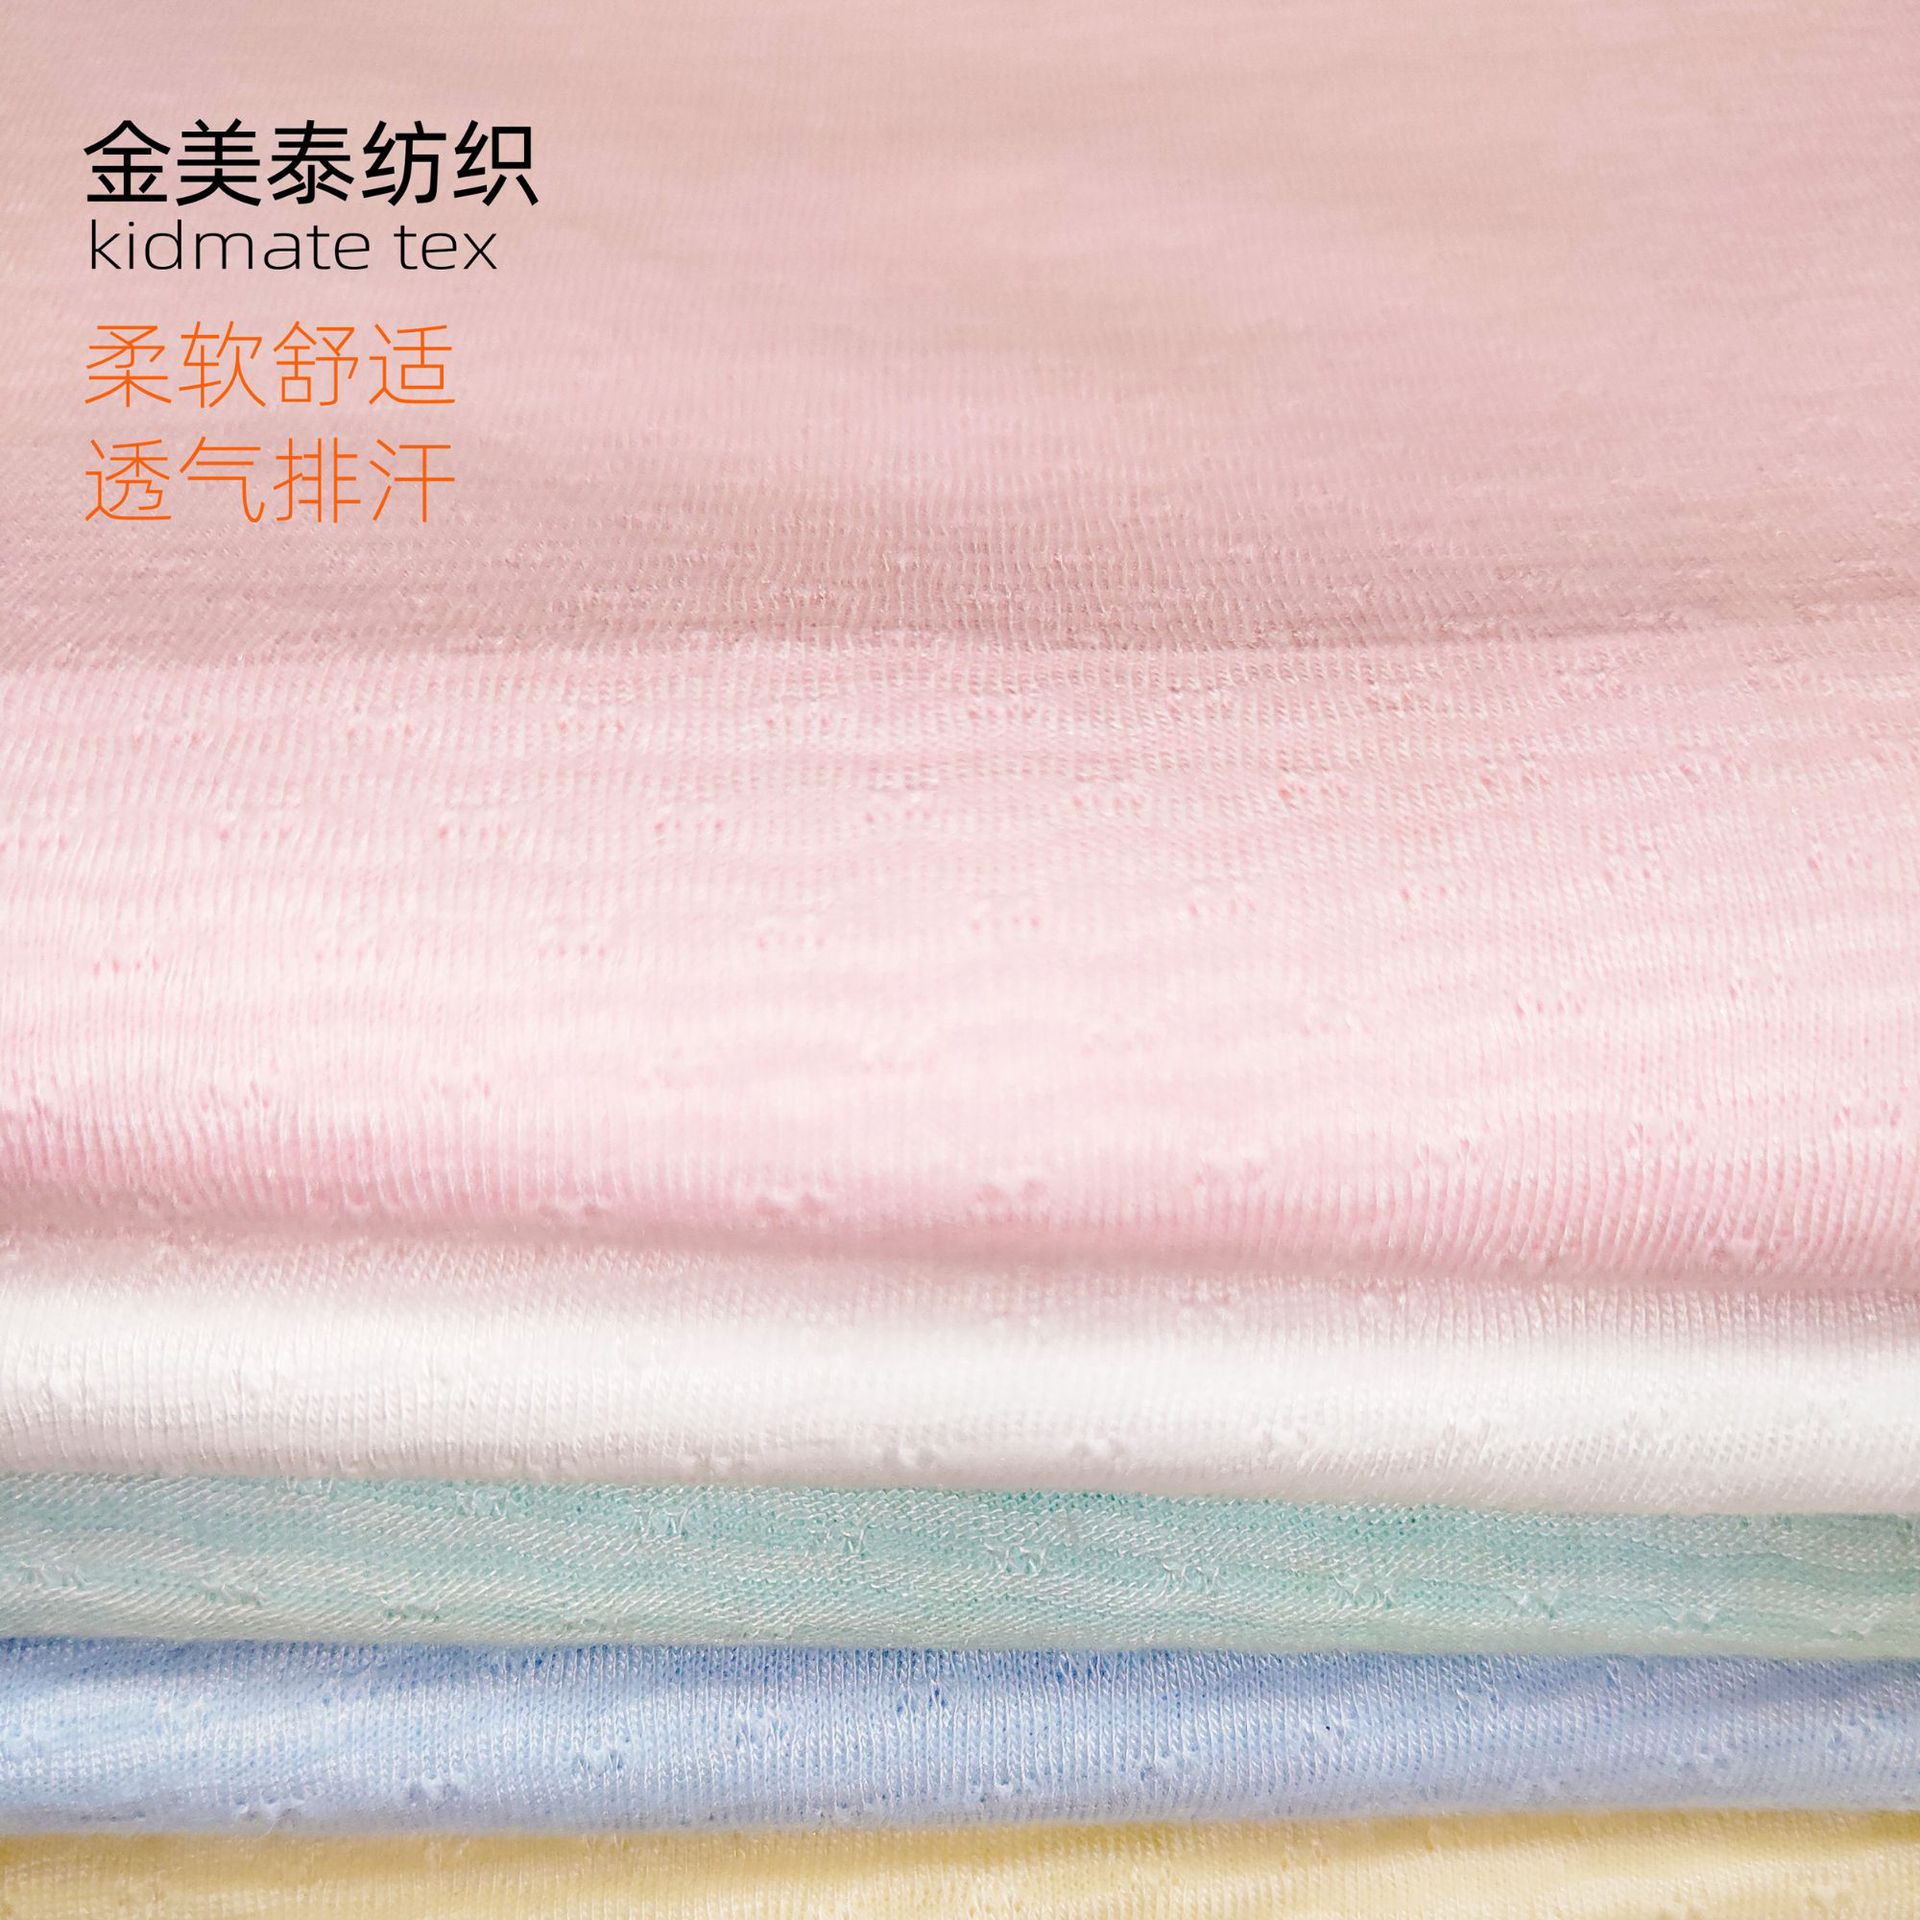 JINMEITAI Baby Underwear Fabric D03941 Hemp Purcell Functional Fabric Baby Jacquard Single Jacquard